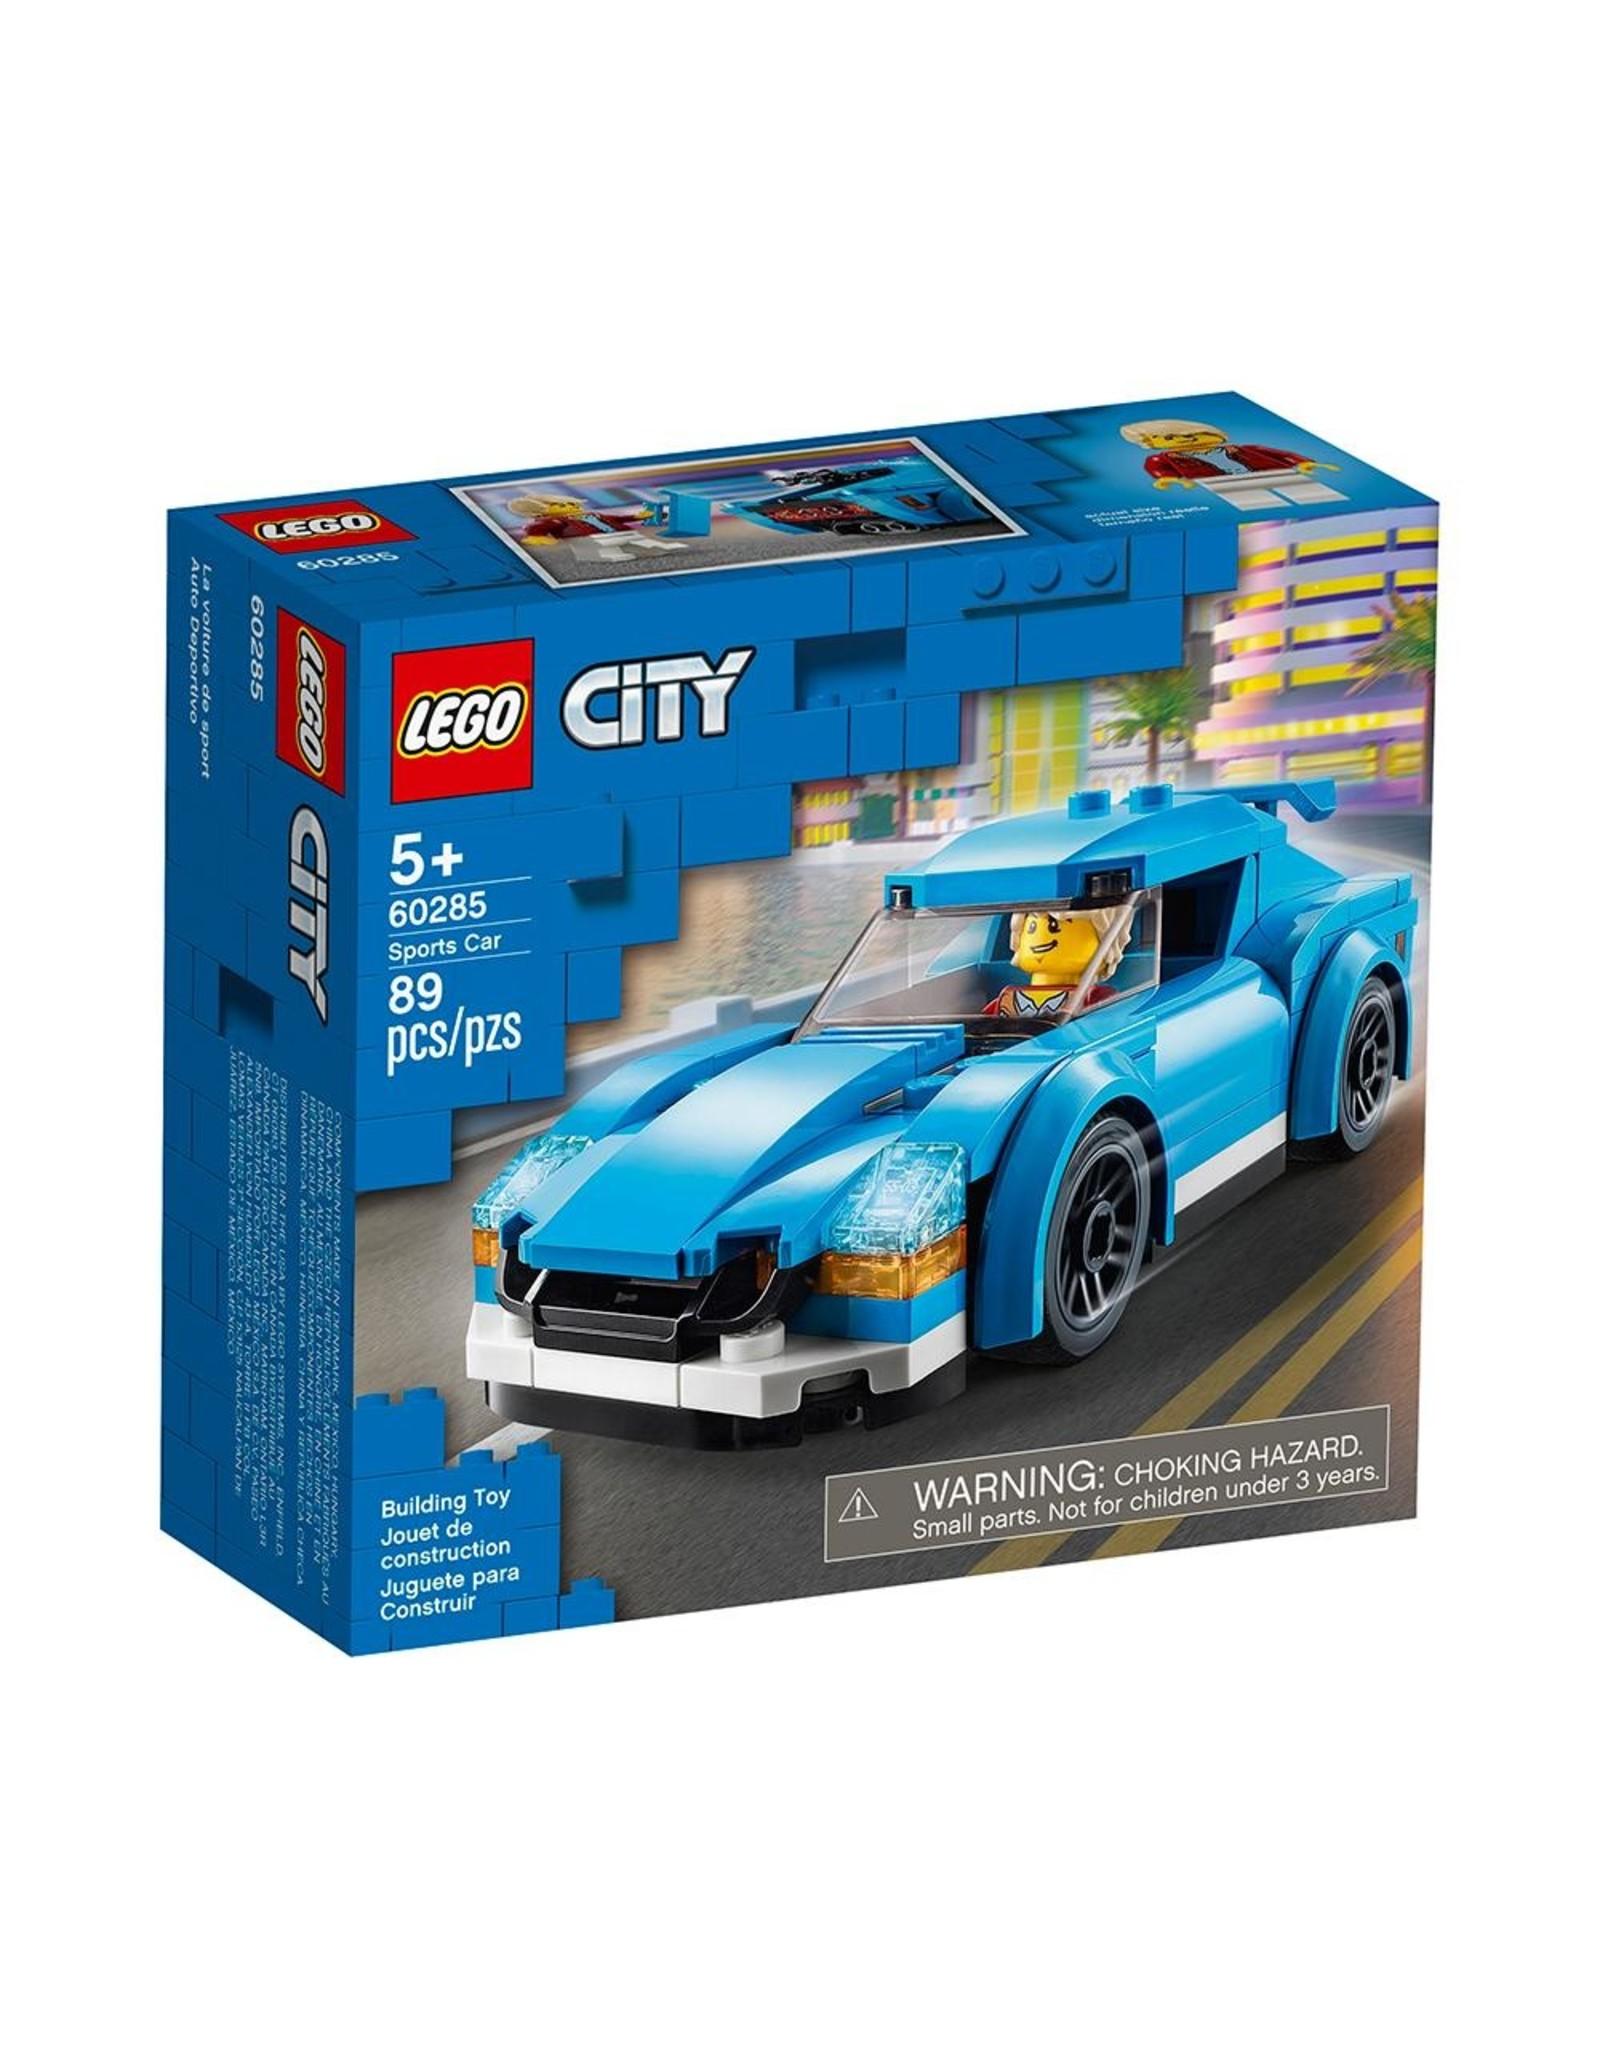 LEGO City Great Vehicles 60285 Sports Car